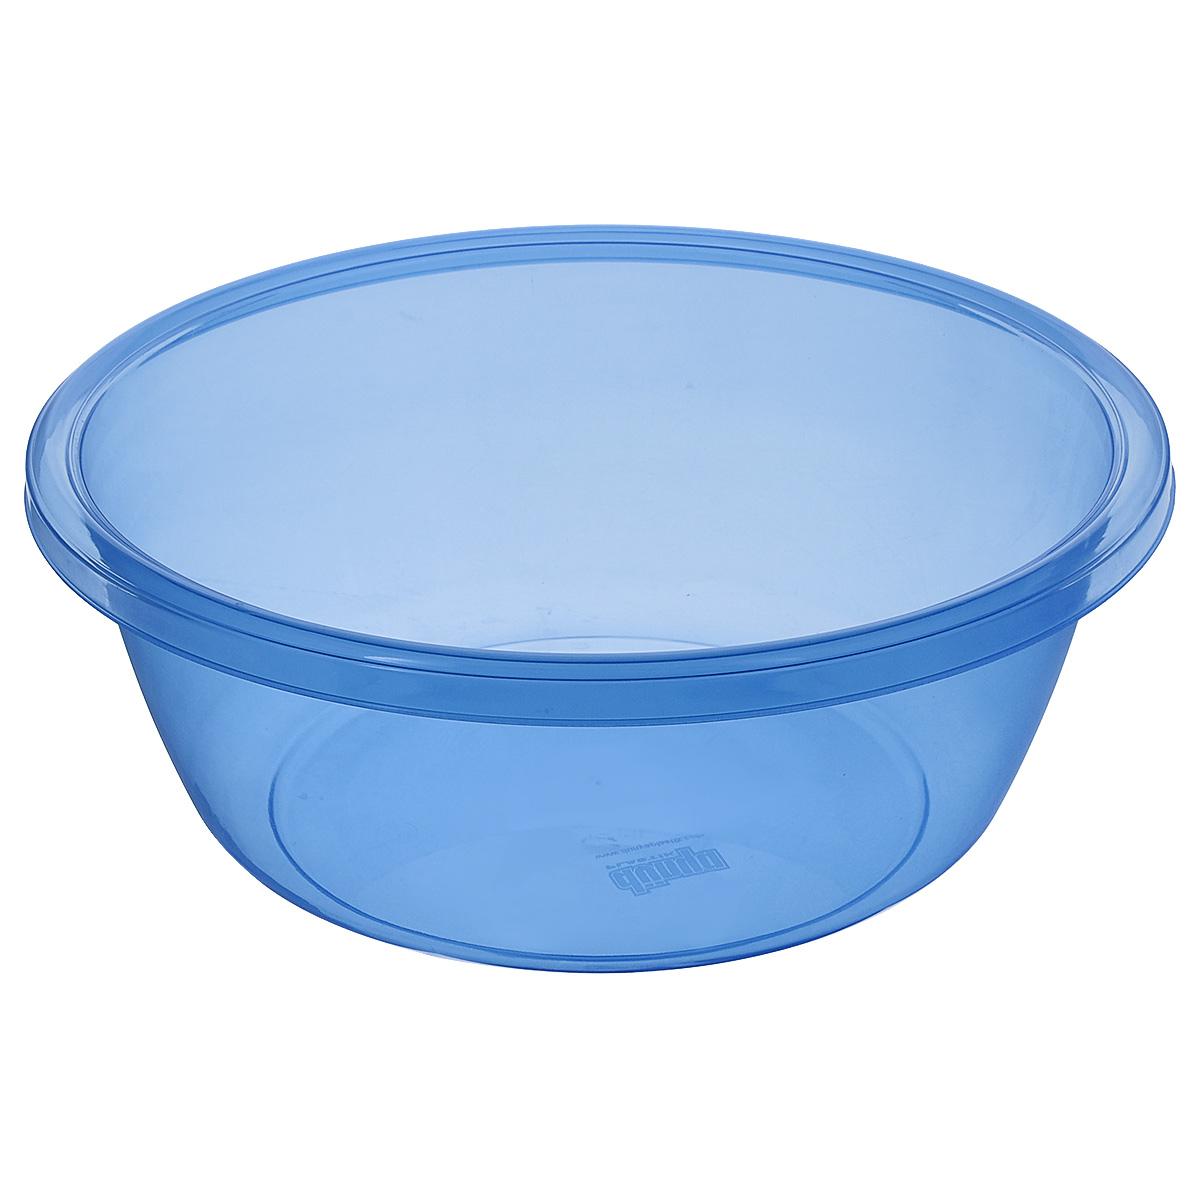 Таз Dunya Plastik, цвет: голубой, 7 л. 10335 фен щетка remington as800 as 800